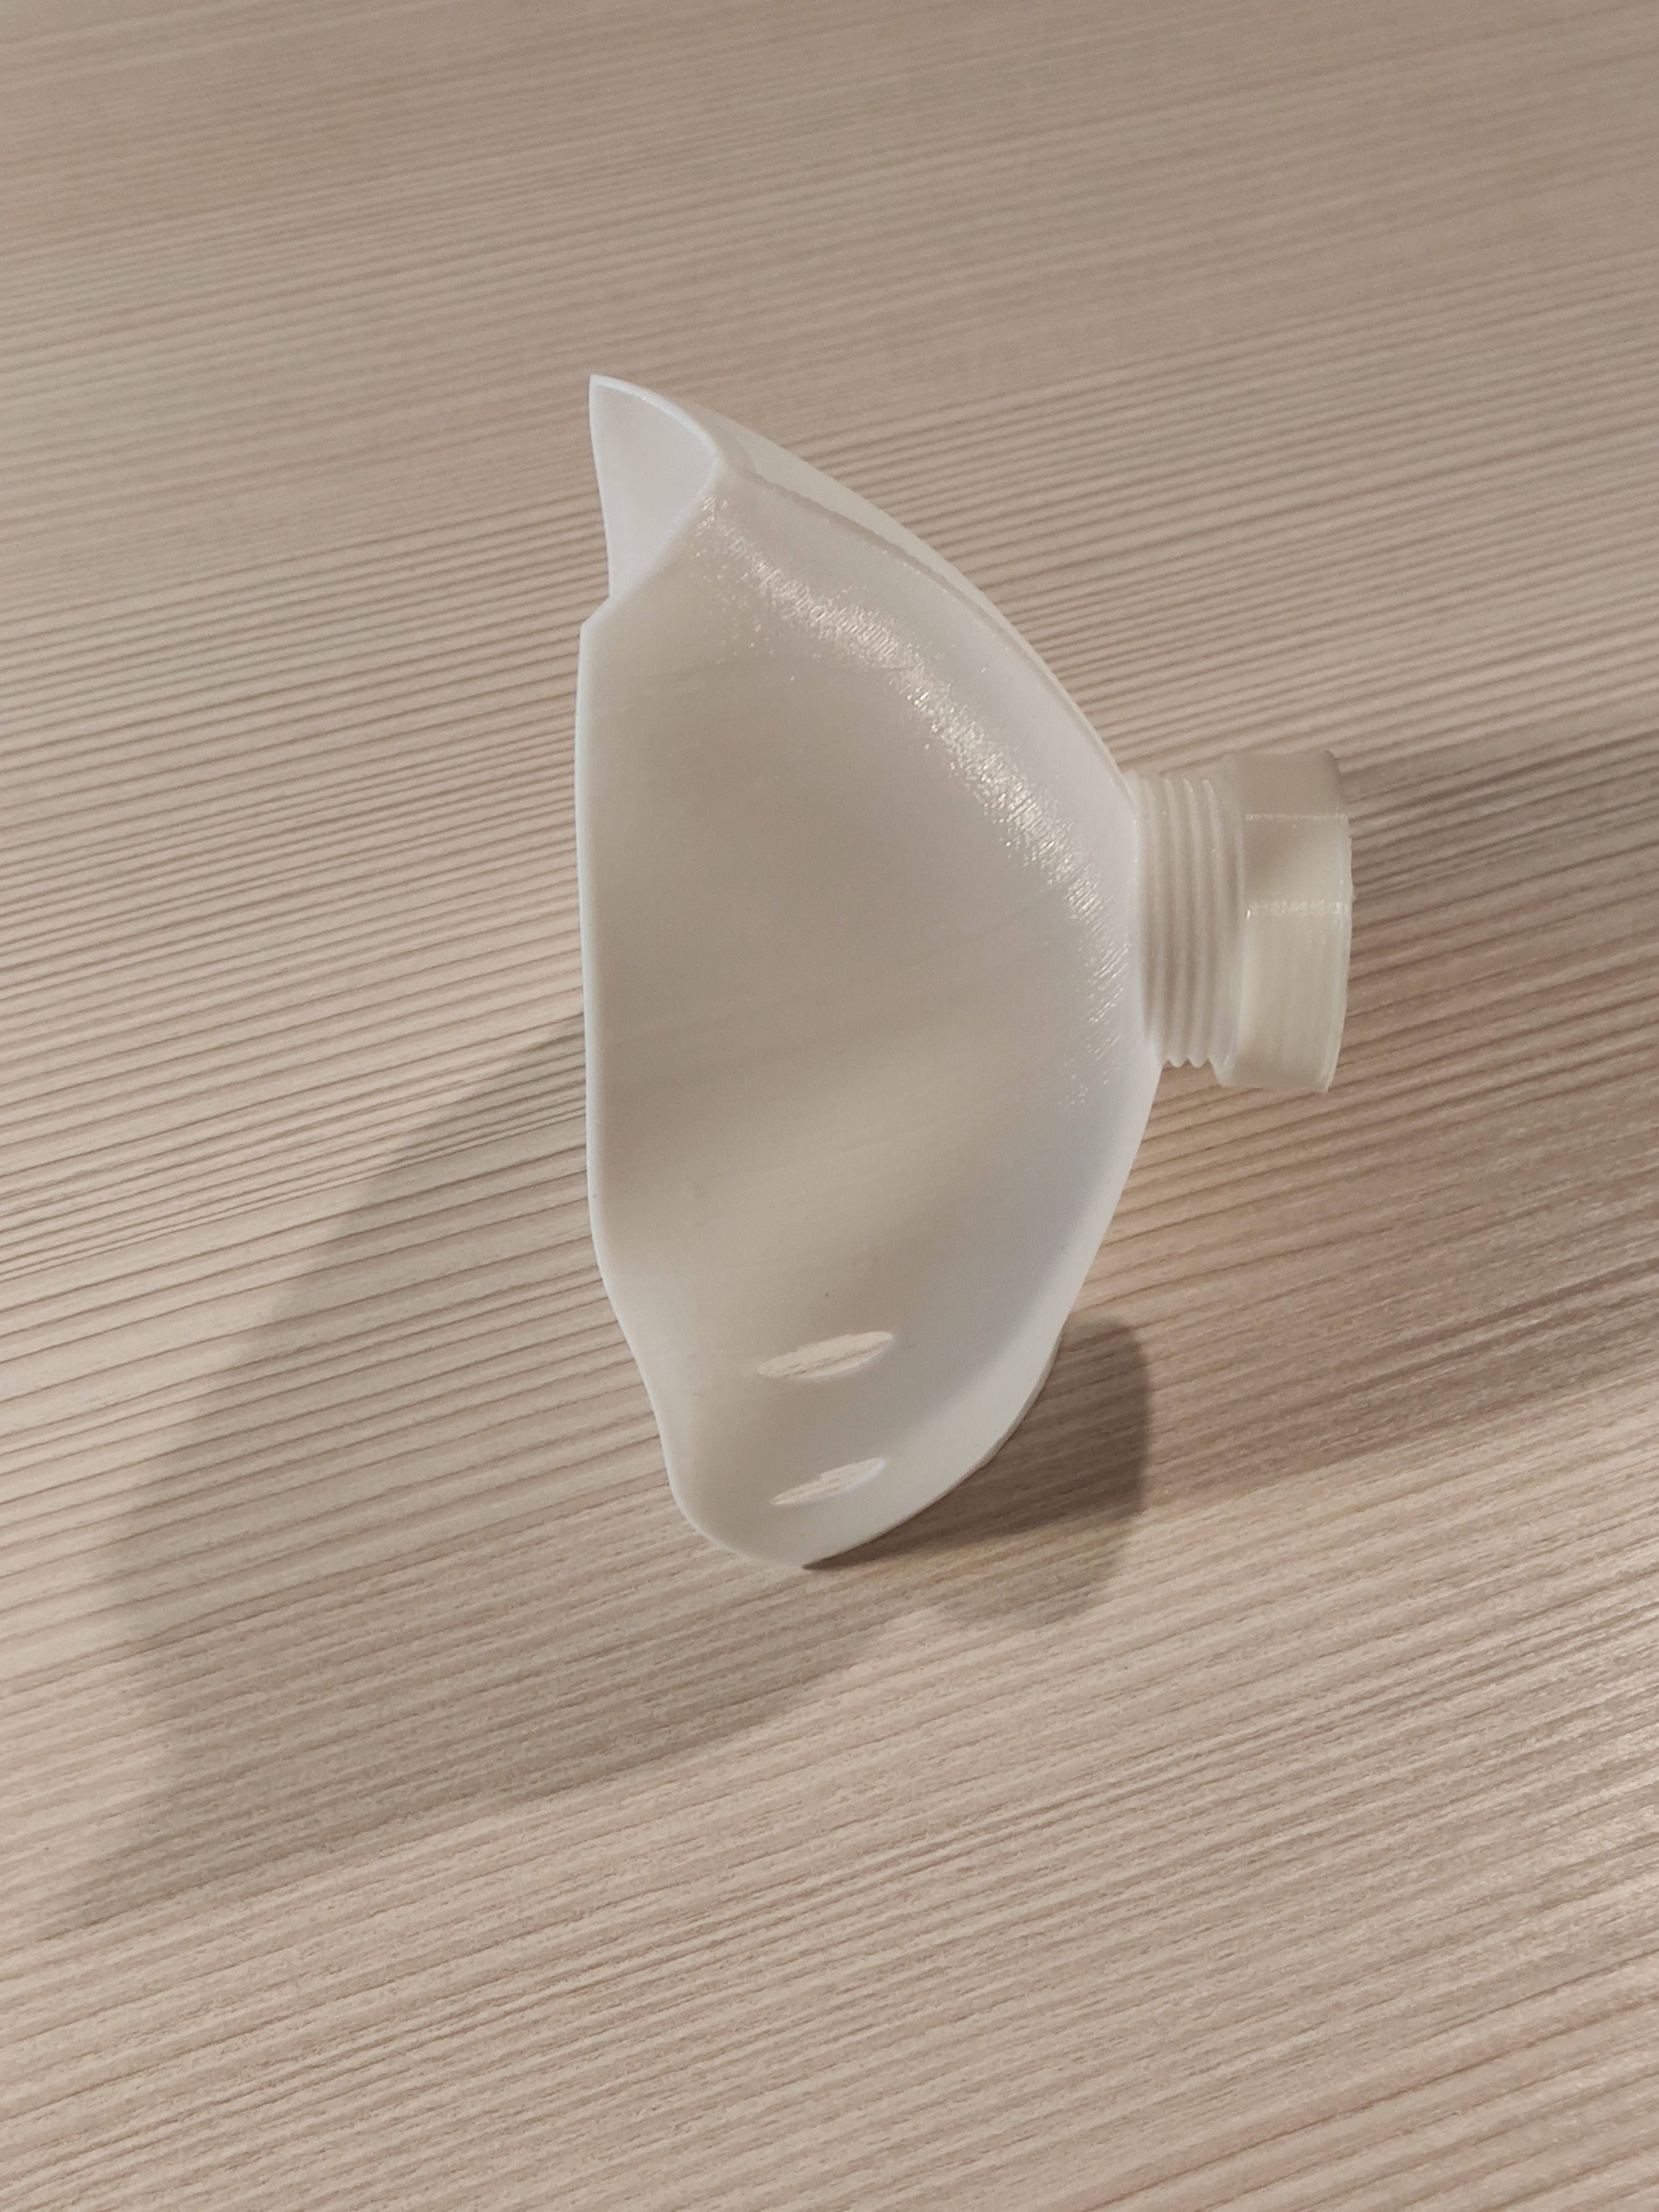 IMG_20200324_211117.jpg Download free STL file Mascherina-COVID-19 • 3D printable design, marcogenito